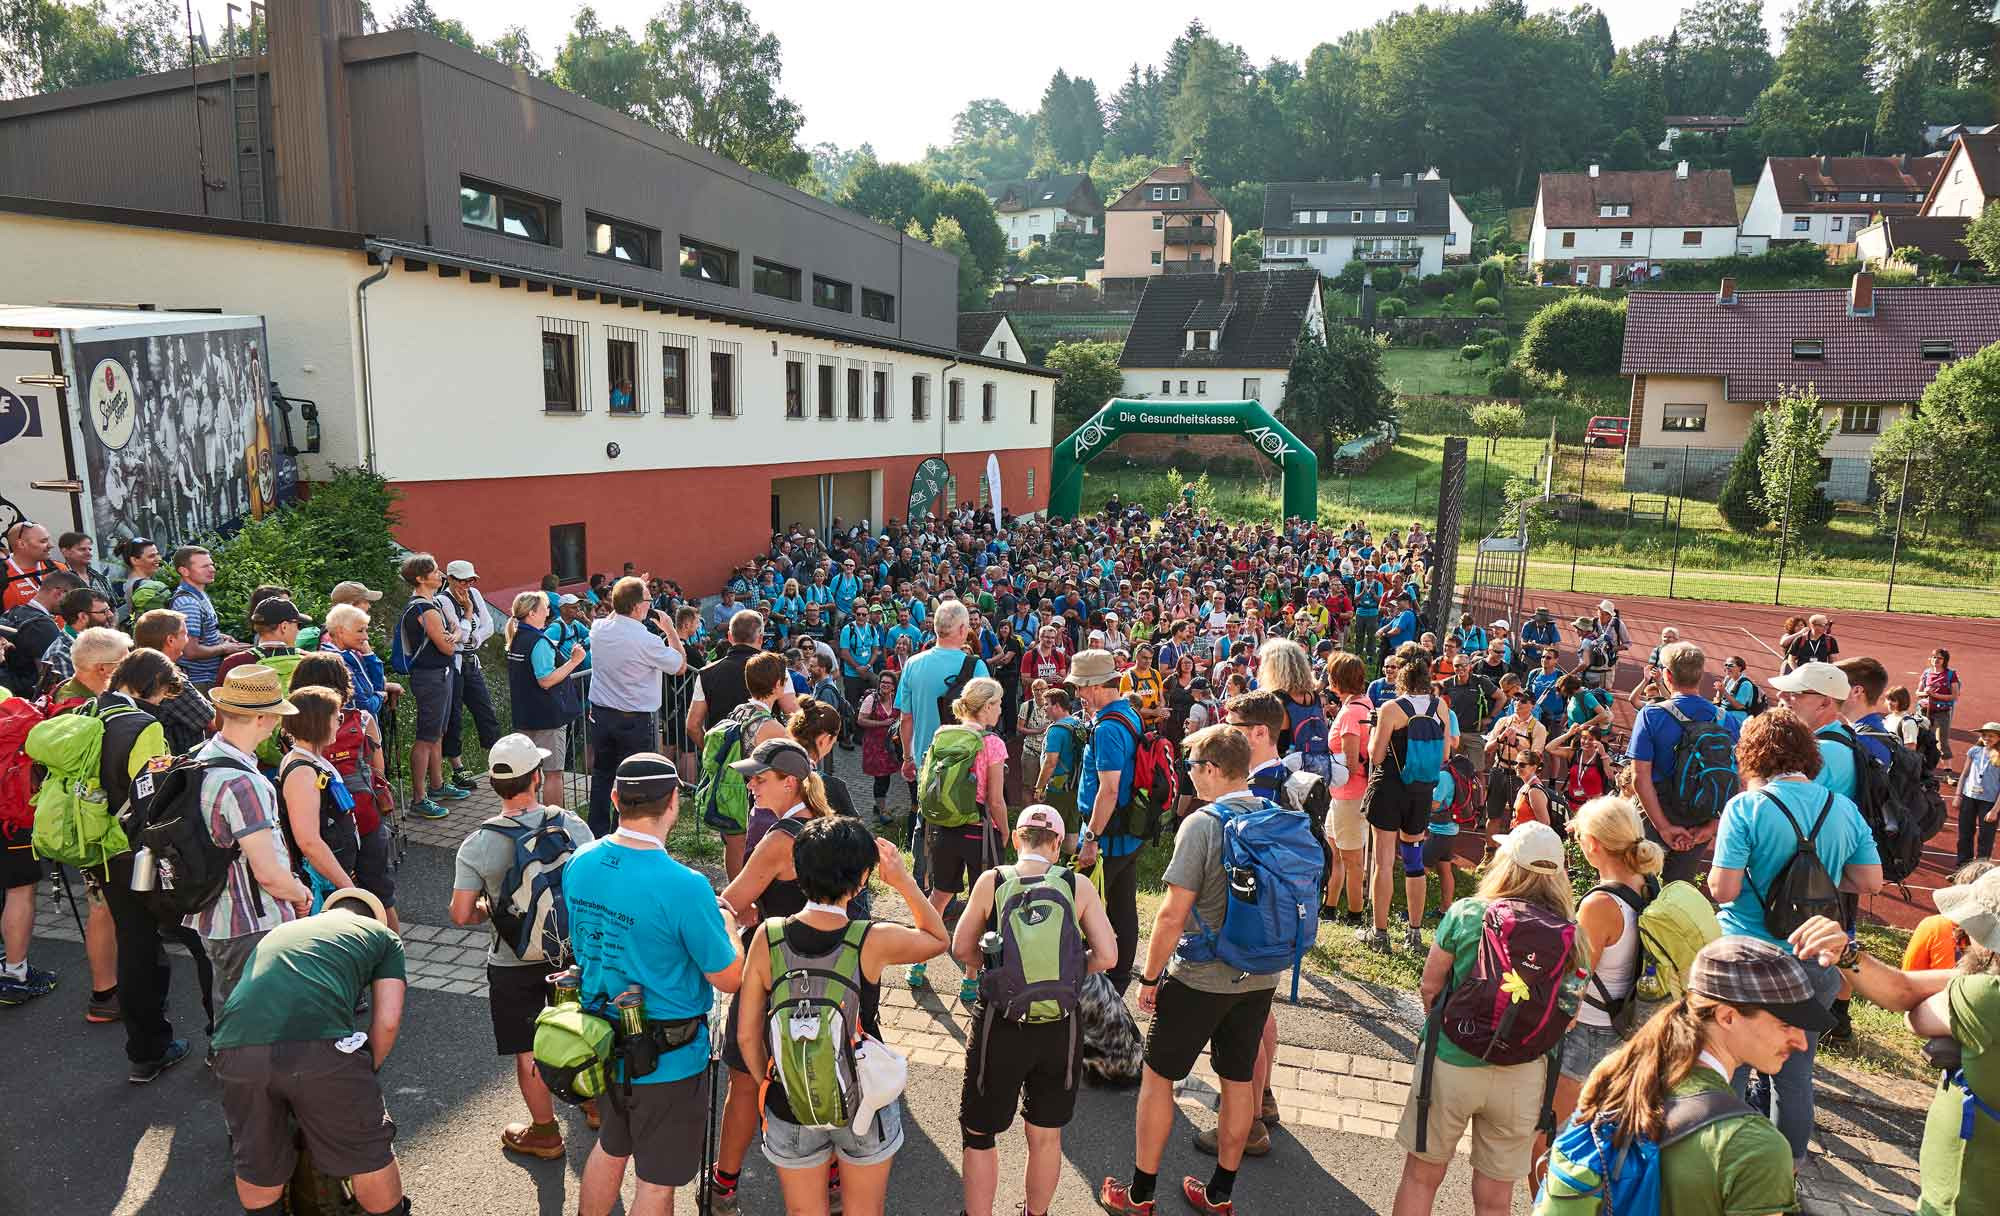 12h-Wanderevent im Räuberland